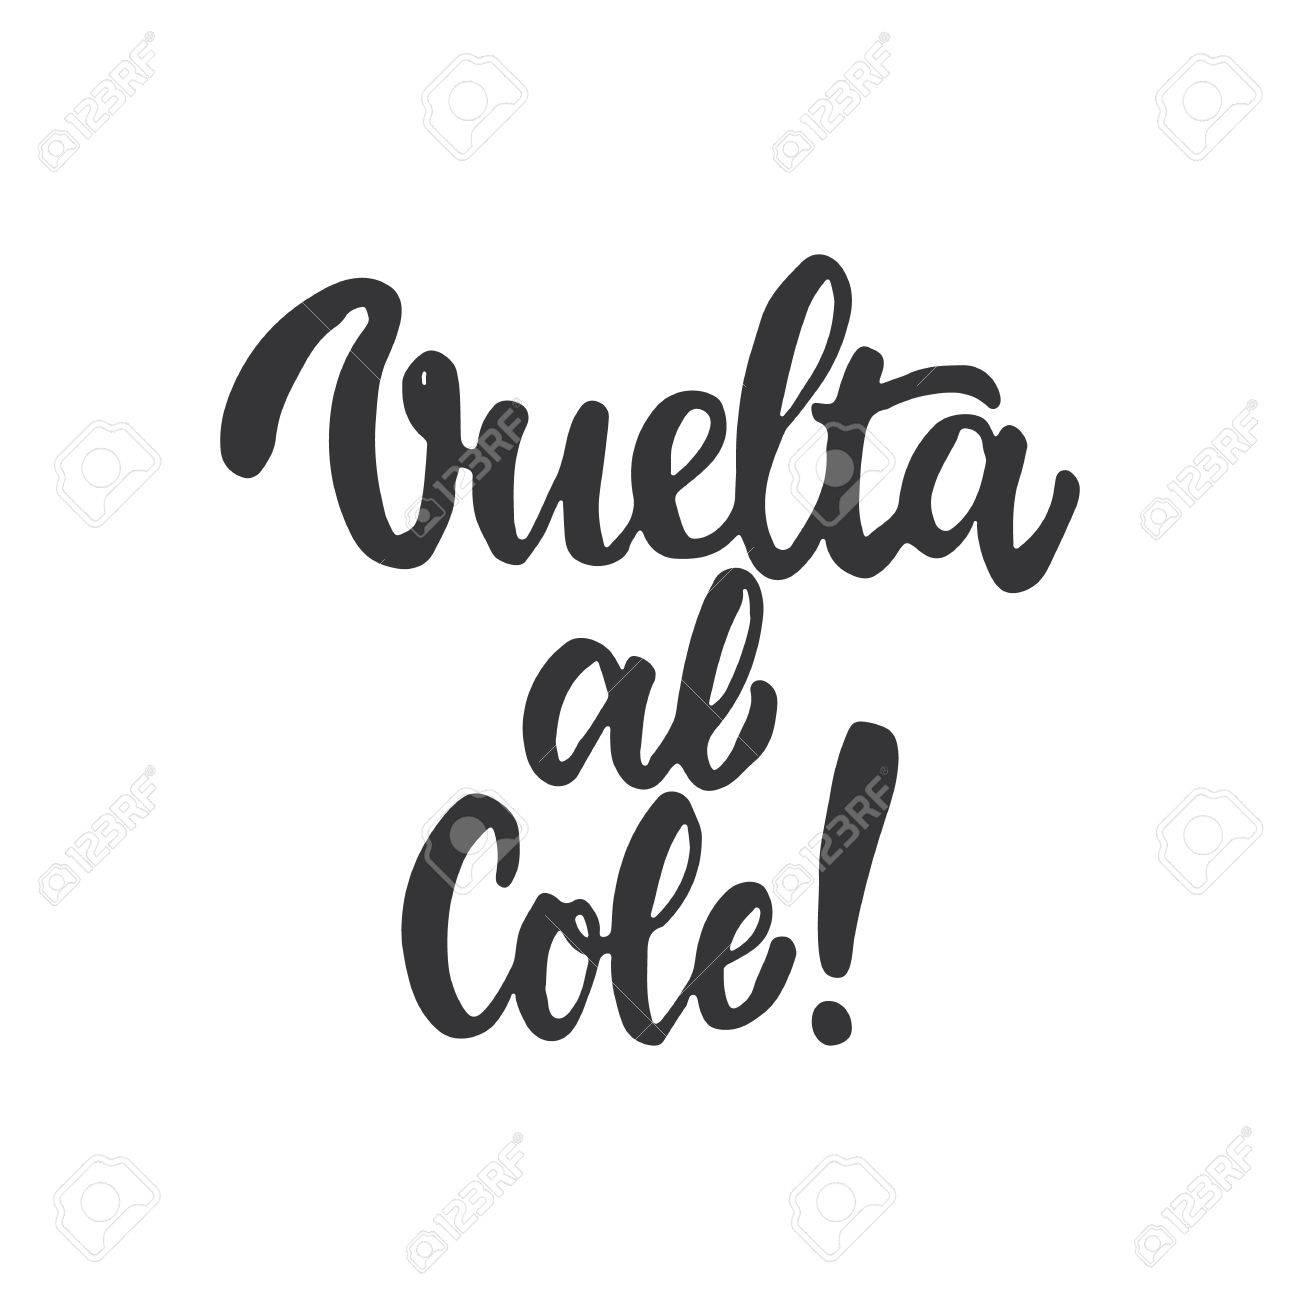 Vuelta Al Cole Back To School Lettering Calligraphy Phrase